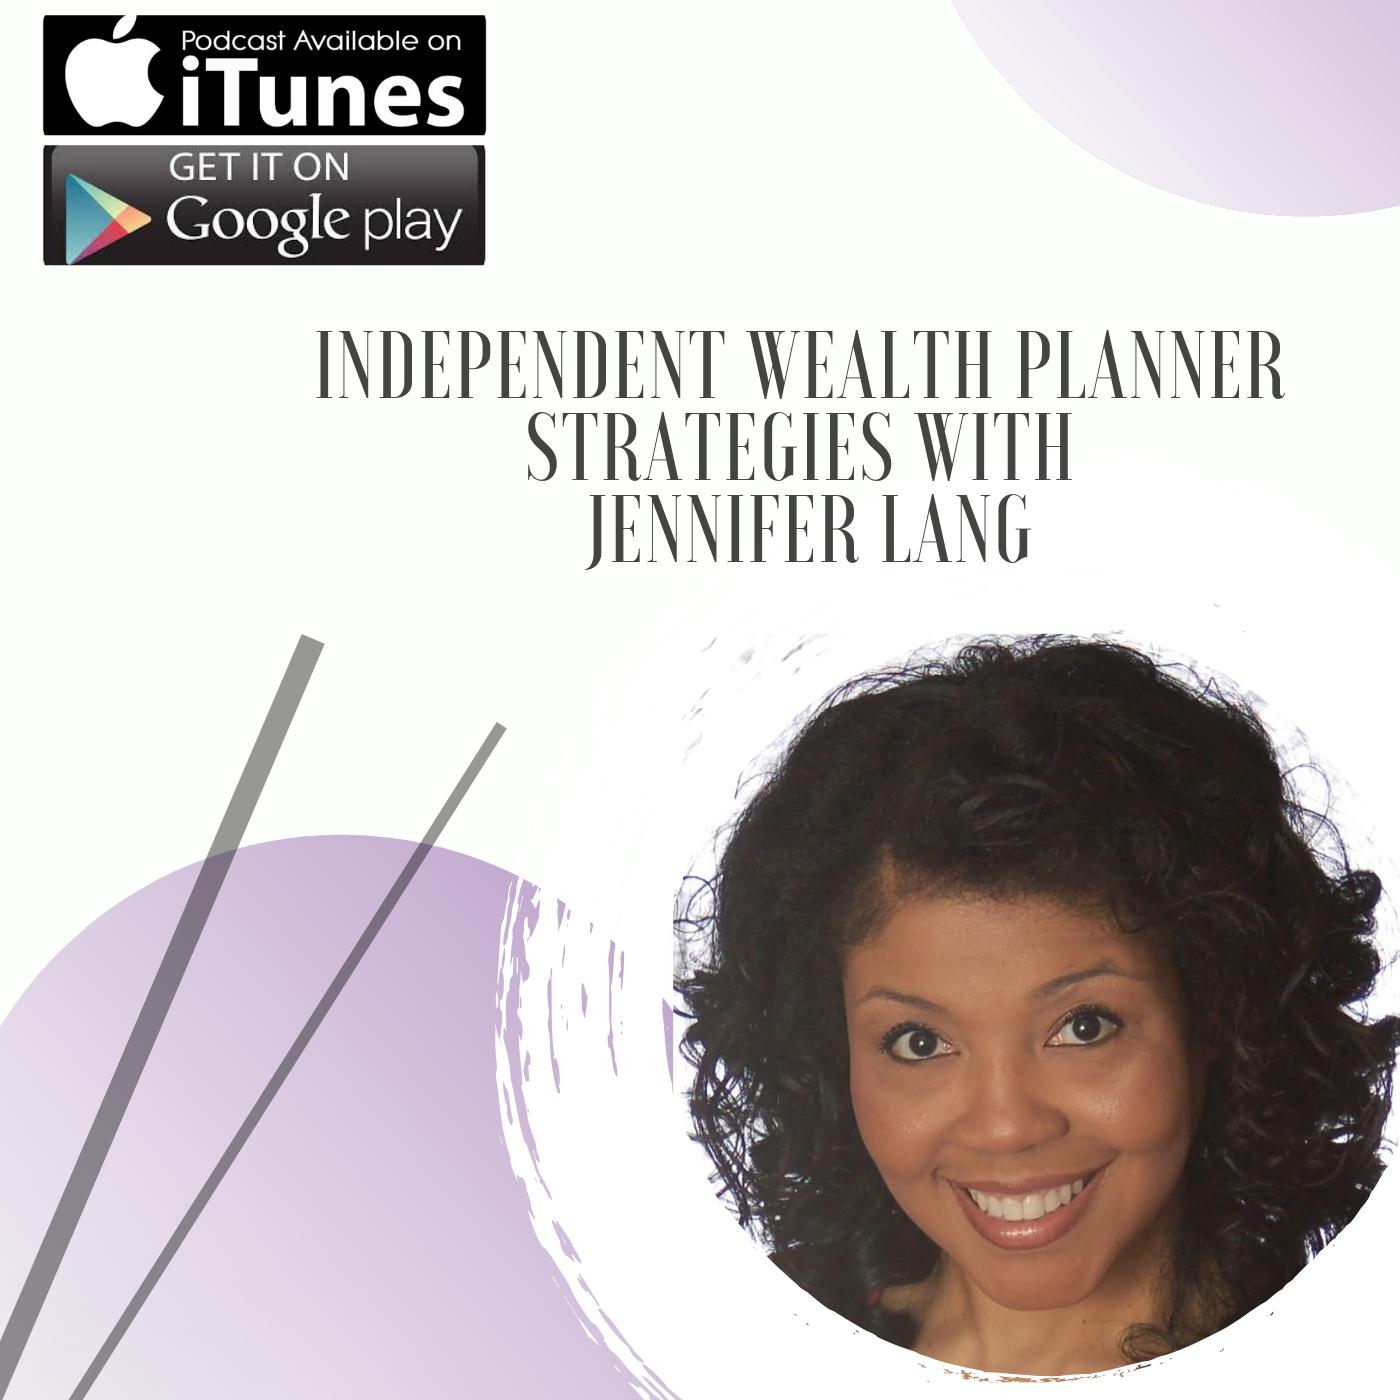 Independent Wealth Planner Strategies with Jennifer Lang.